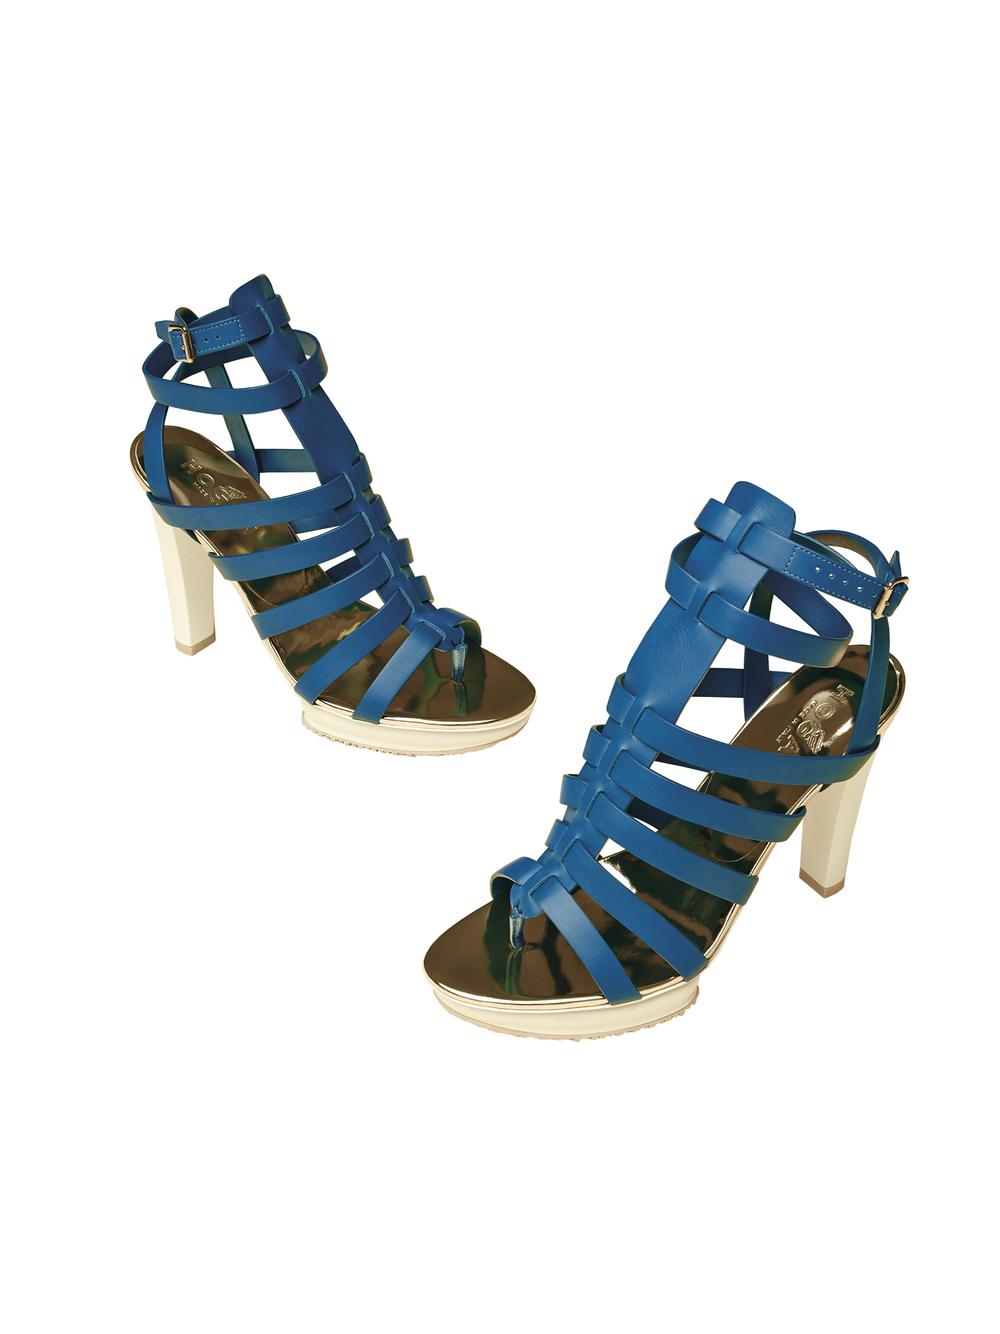 09-gladiator sandals in blue leather.jpg